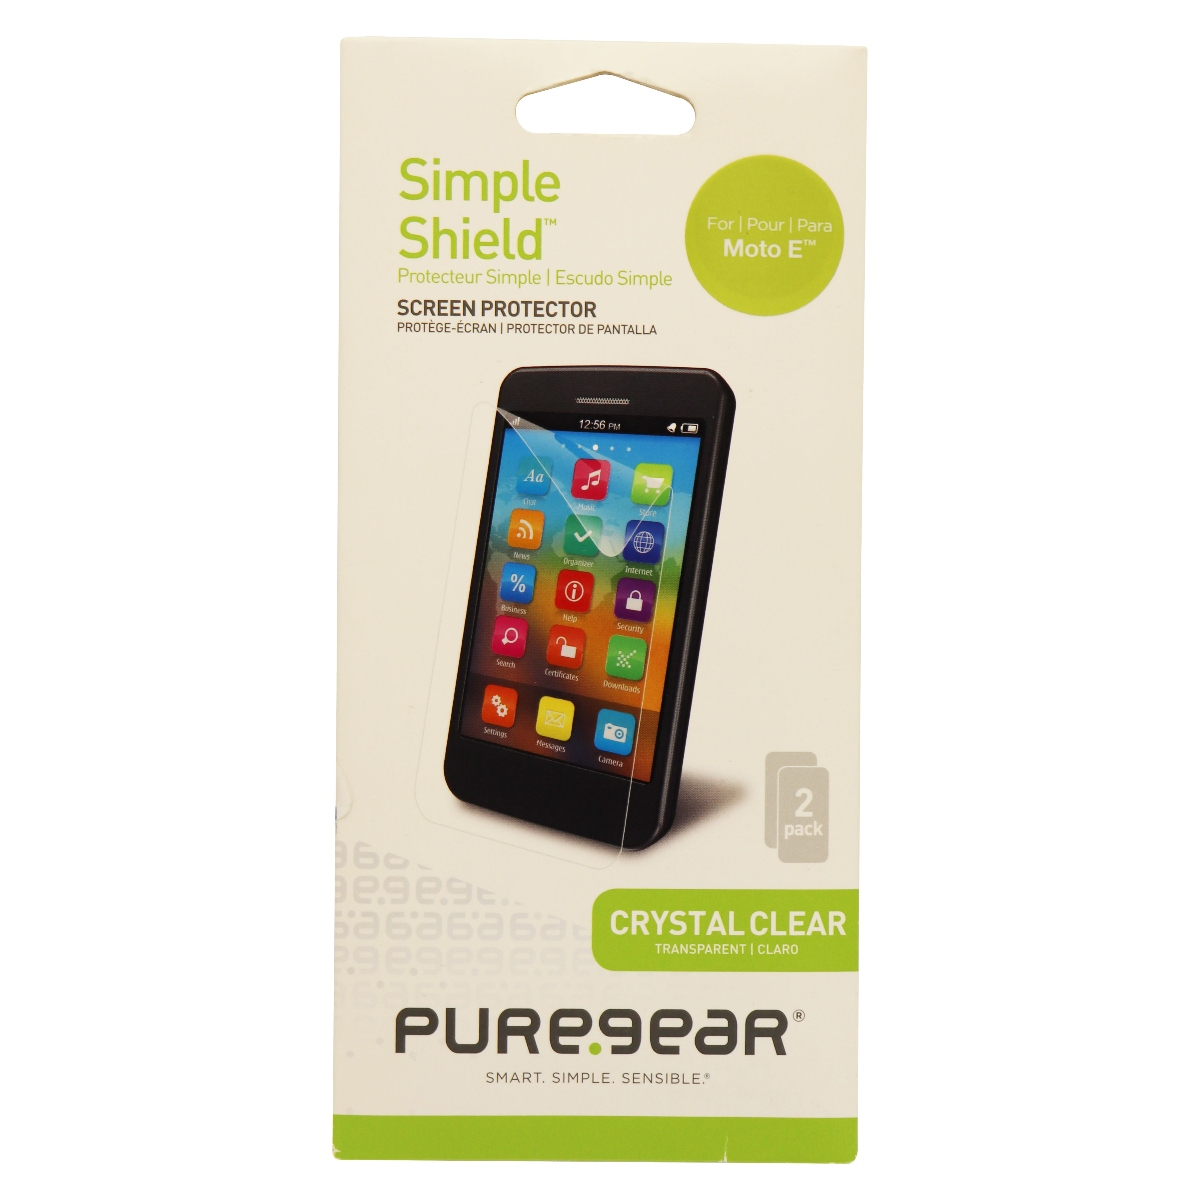 PureGear Simple Shield Screen Protector for Moto E - Clear